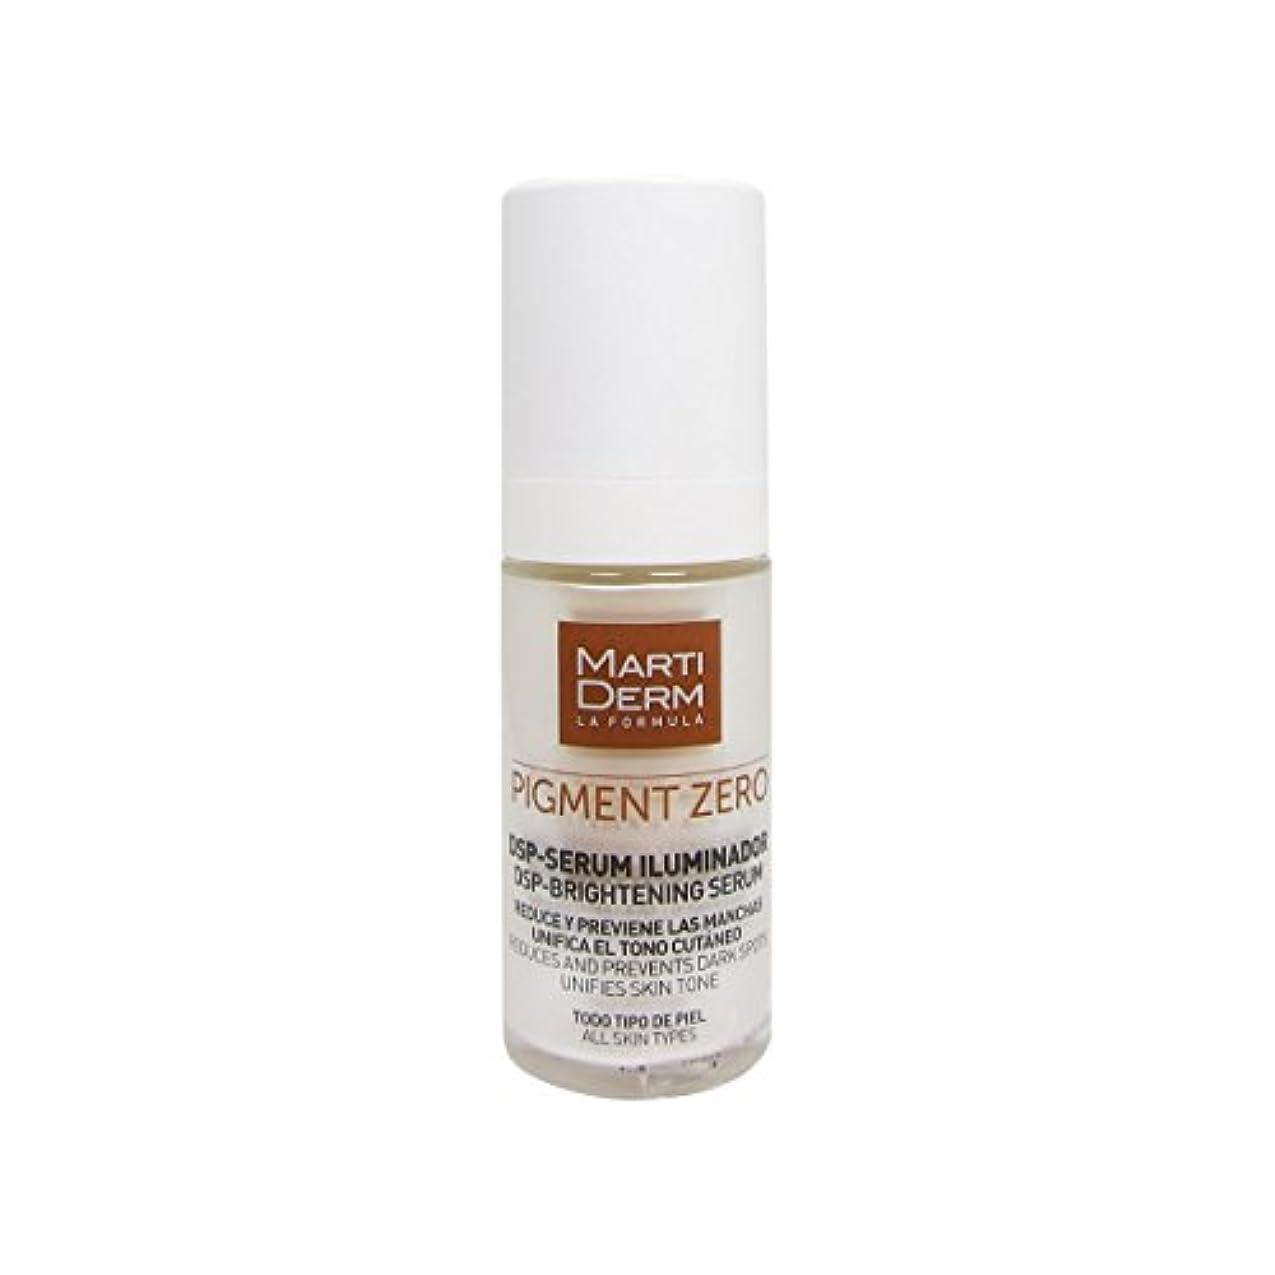 原告パン格差Martiderm Pigment Zero Dsp-brightening Serum 30ml [並行輸入品]